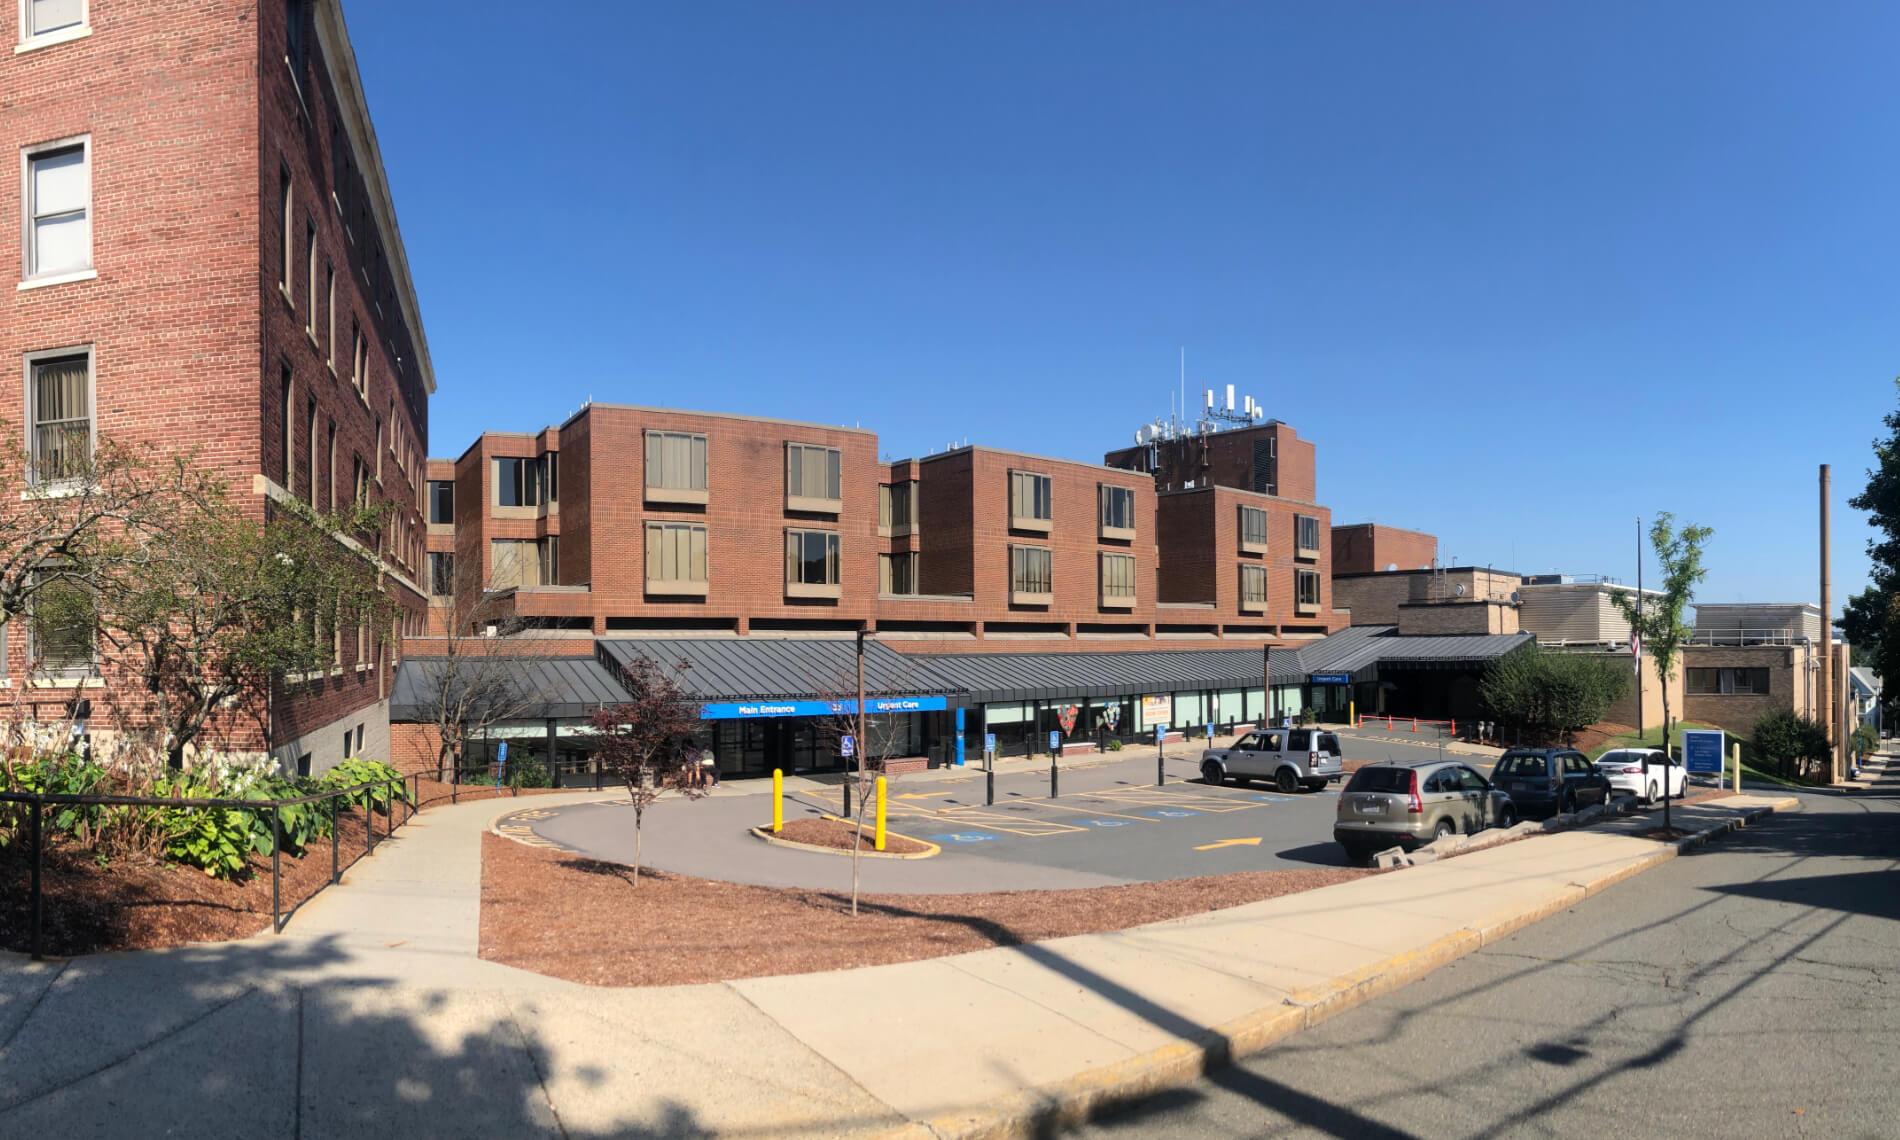 CHA Somerville Campus exterior photo